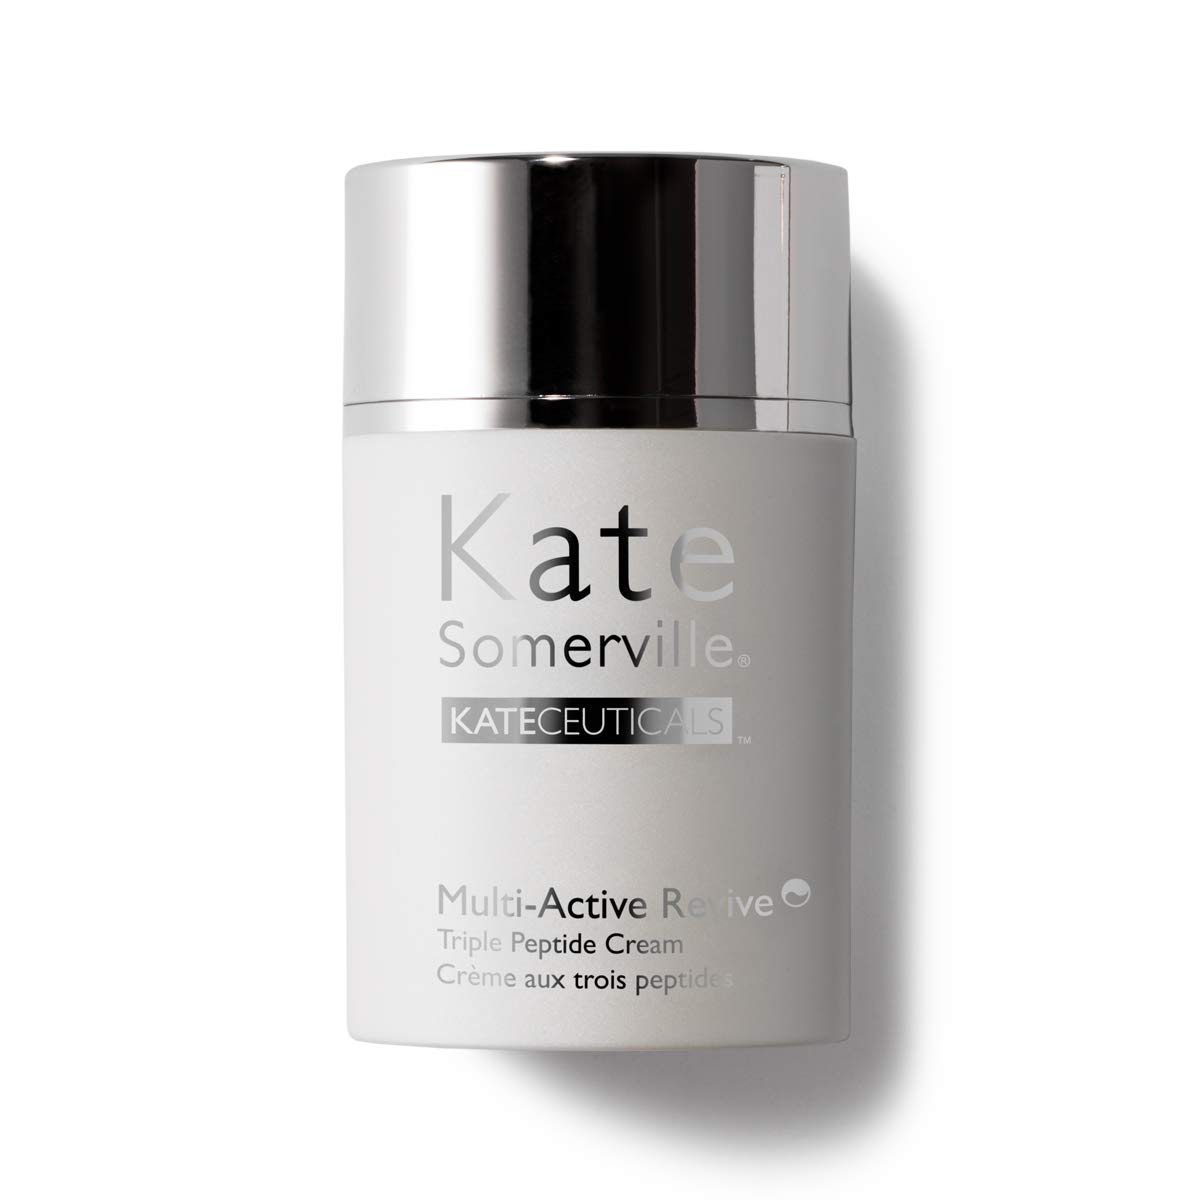 Kate Somerville KateCeuticals Multi-Active Revive Triple Peptide Cream